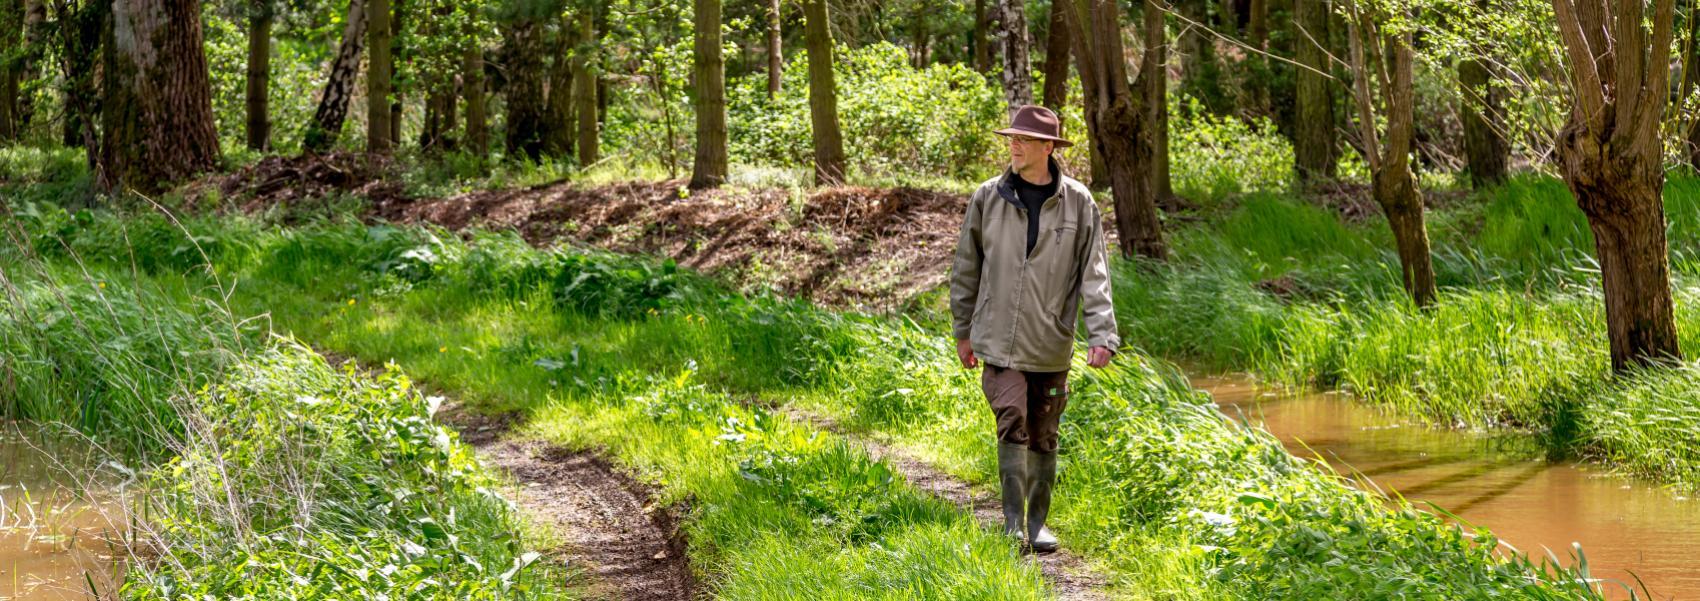 wandelaar langs het beekje in het bos